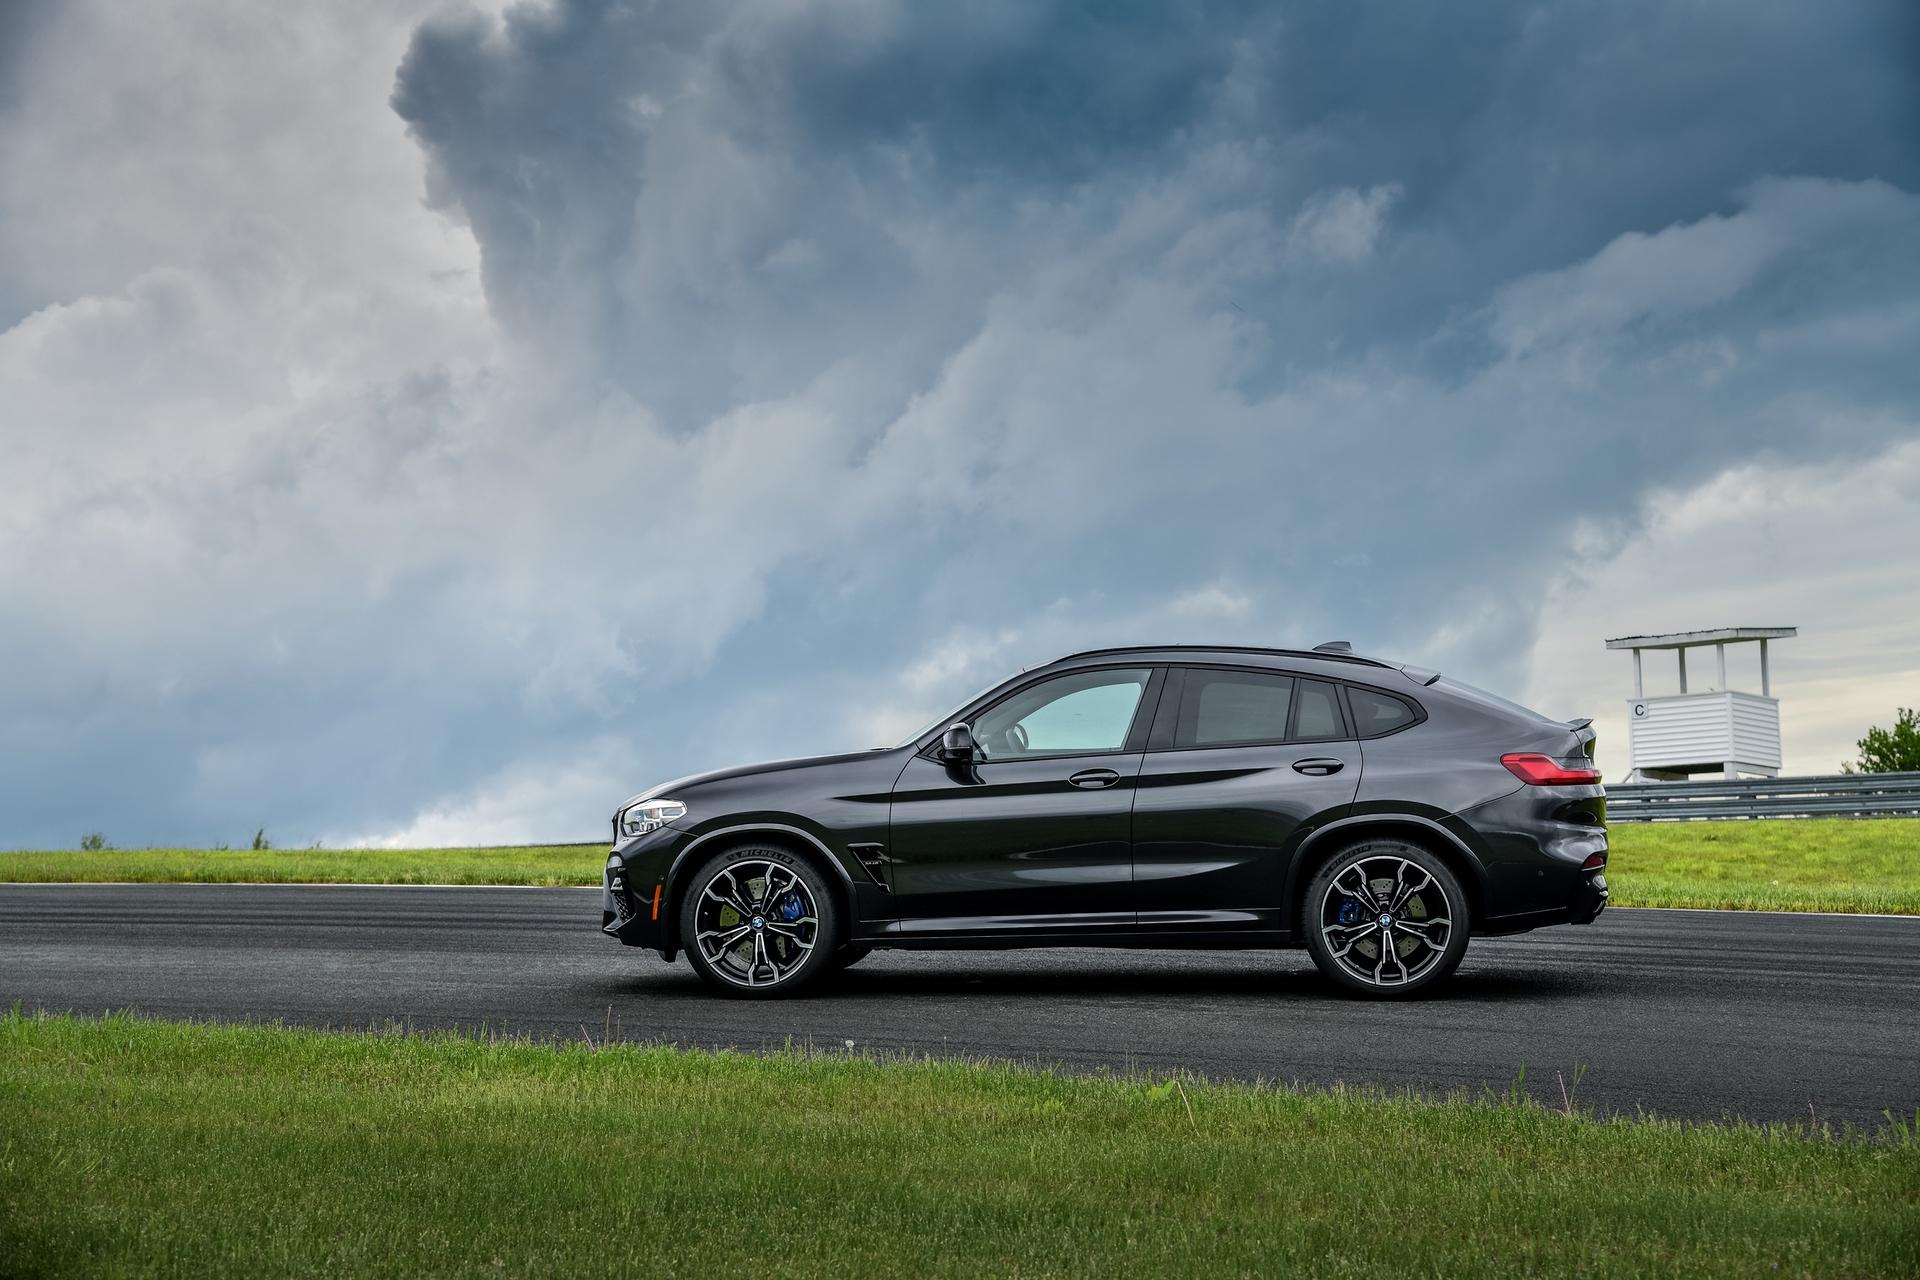 2020 Bmw X4 M Looks Imposing In Sophisto Grey Color